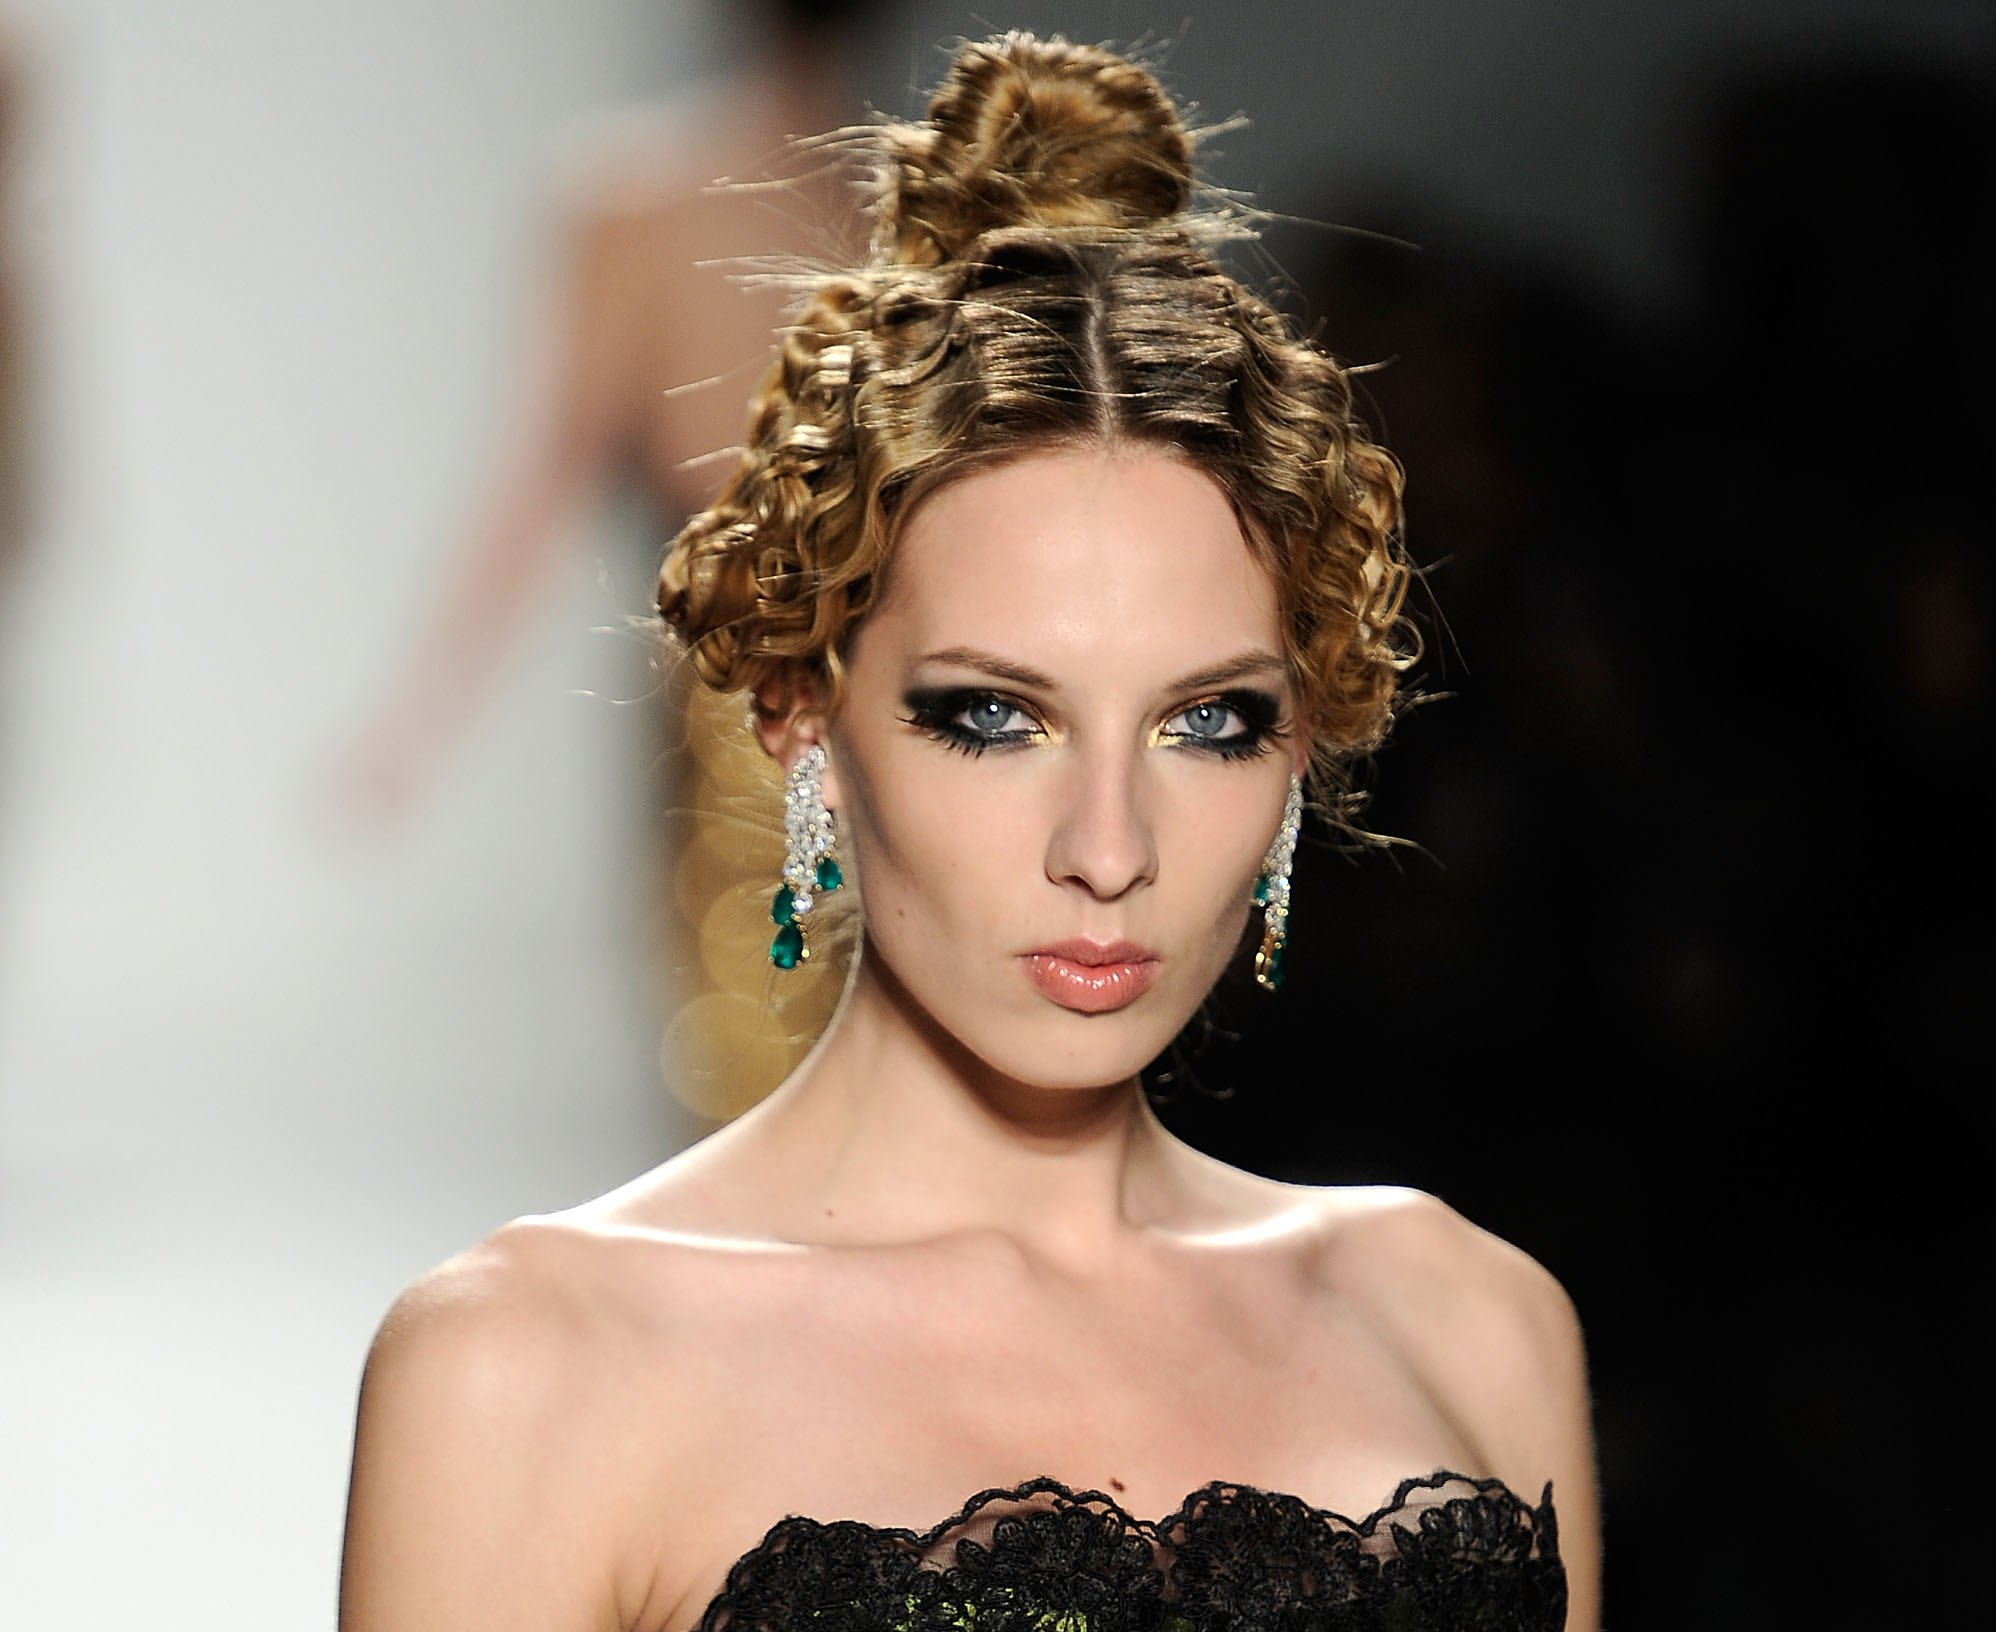 Дизайнер Кеті Стерн (Kati Stern) бренда Venexiana представила осіню колекцію 2012 на Mercedes-Benz Fashion Week. Фото: Fernanda Calfat/Getty Images